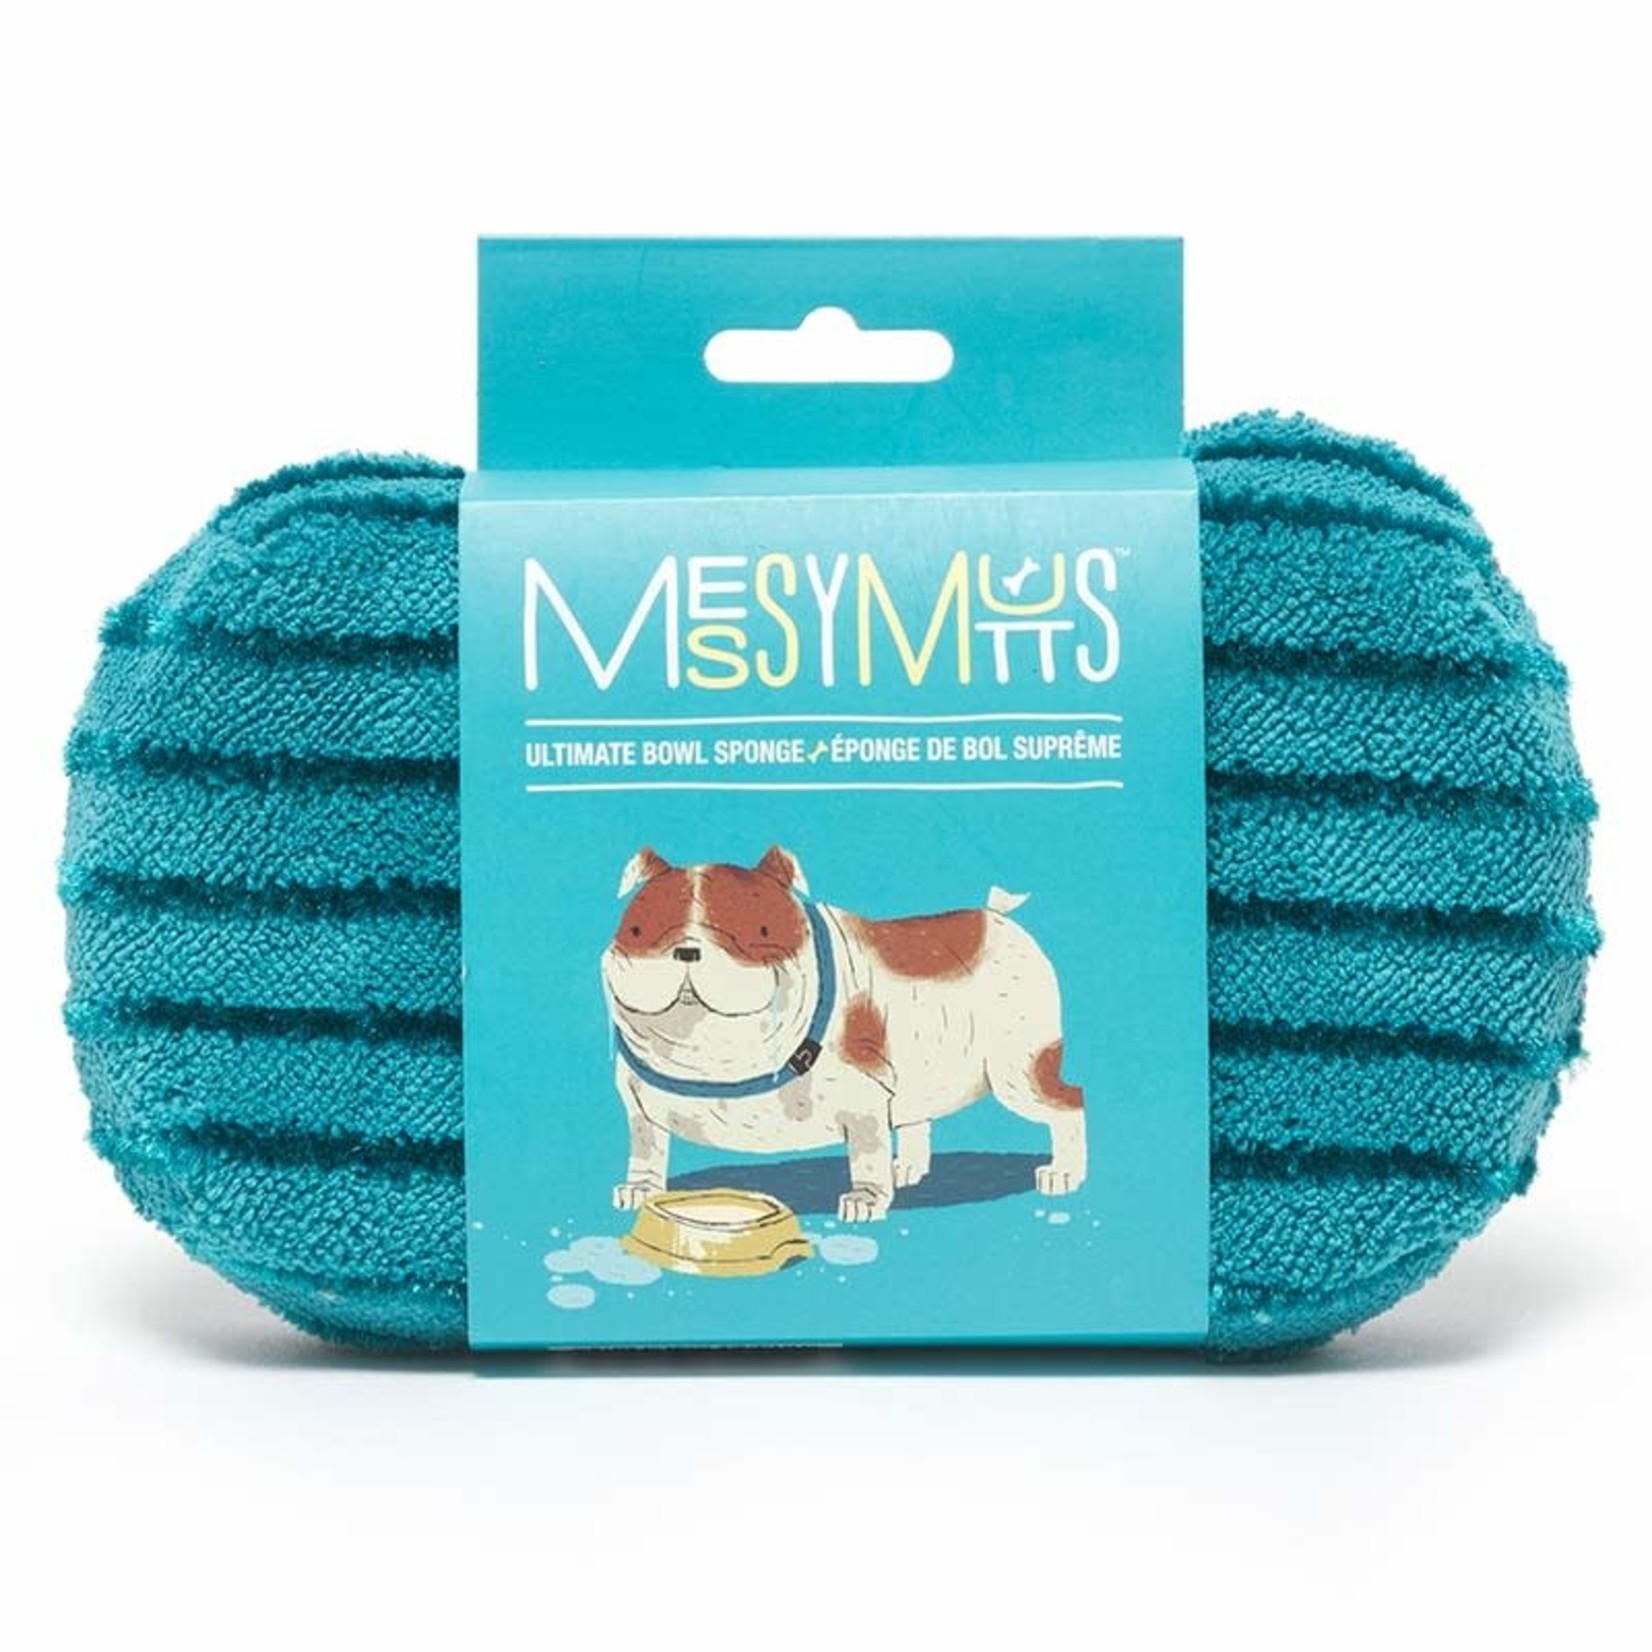 Messy Mutts Messy Mutts Bowl Sponge Blue